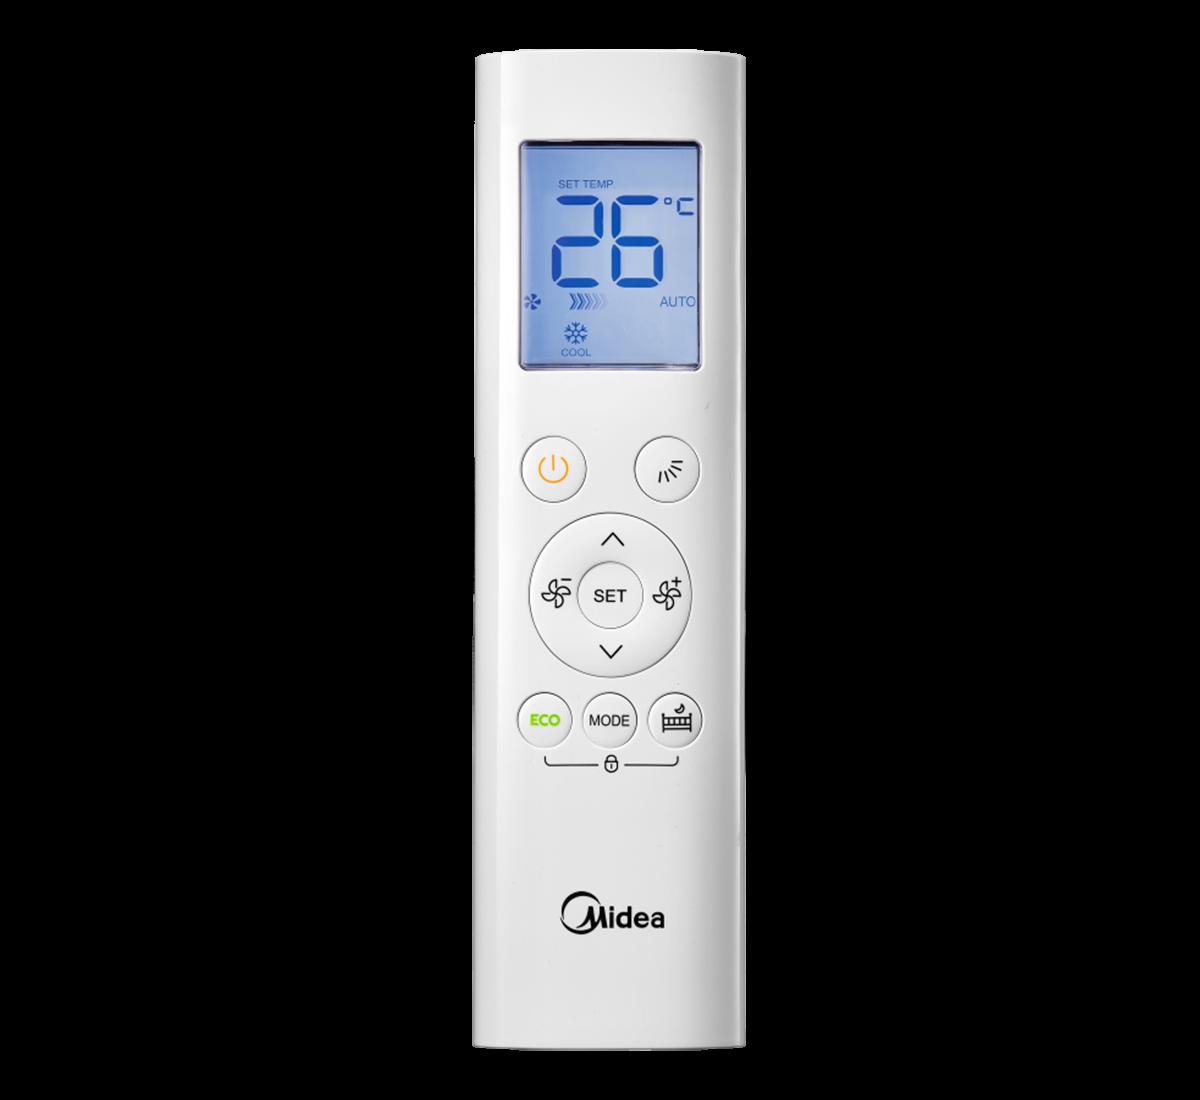 aire acondicionado conjunto split midea inverter mando a diastanacia rg58e4 bgef modelo vertu plus 26 09 n8 instalacion incluida caseragua